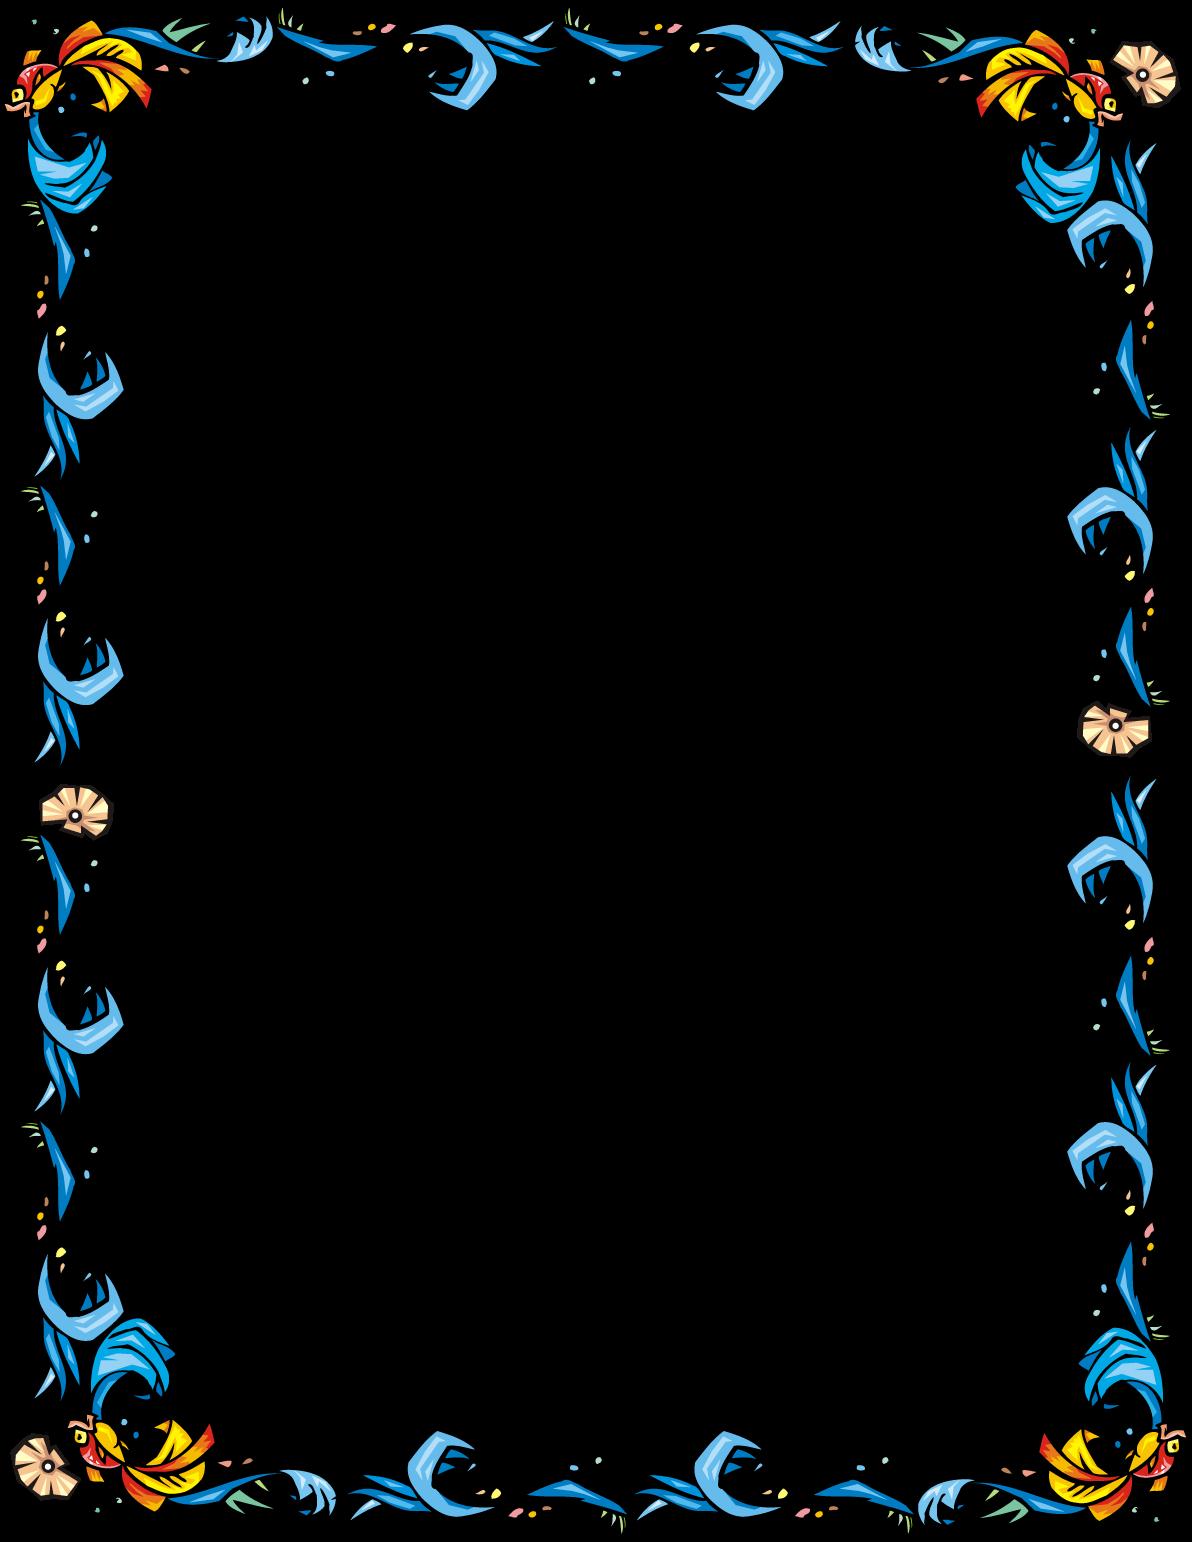 Картинки рамки для оформления текста в ворде, поздравление матери открытки